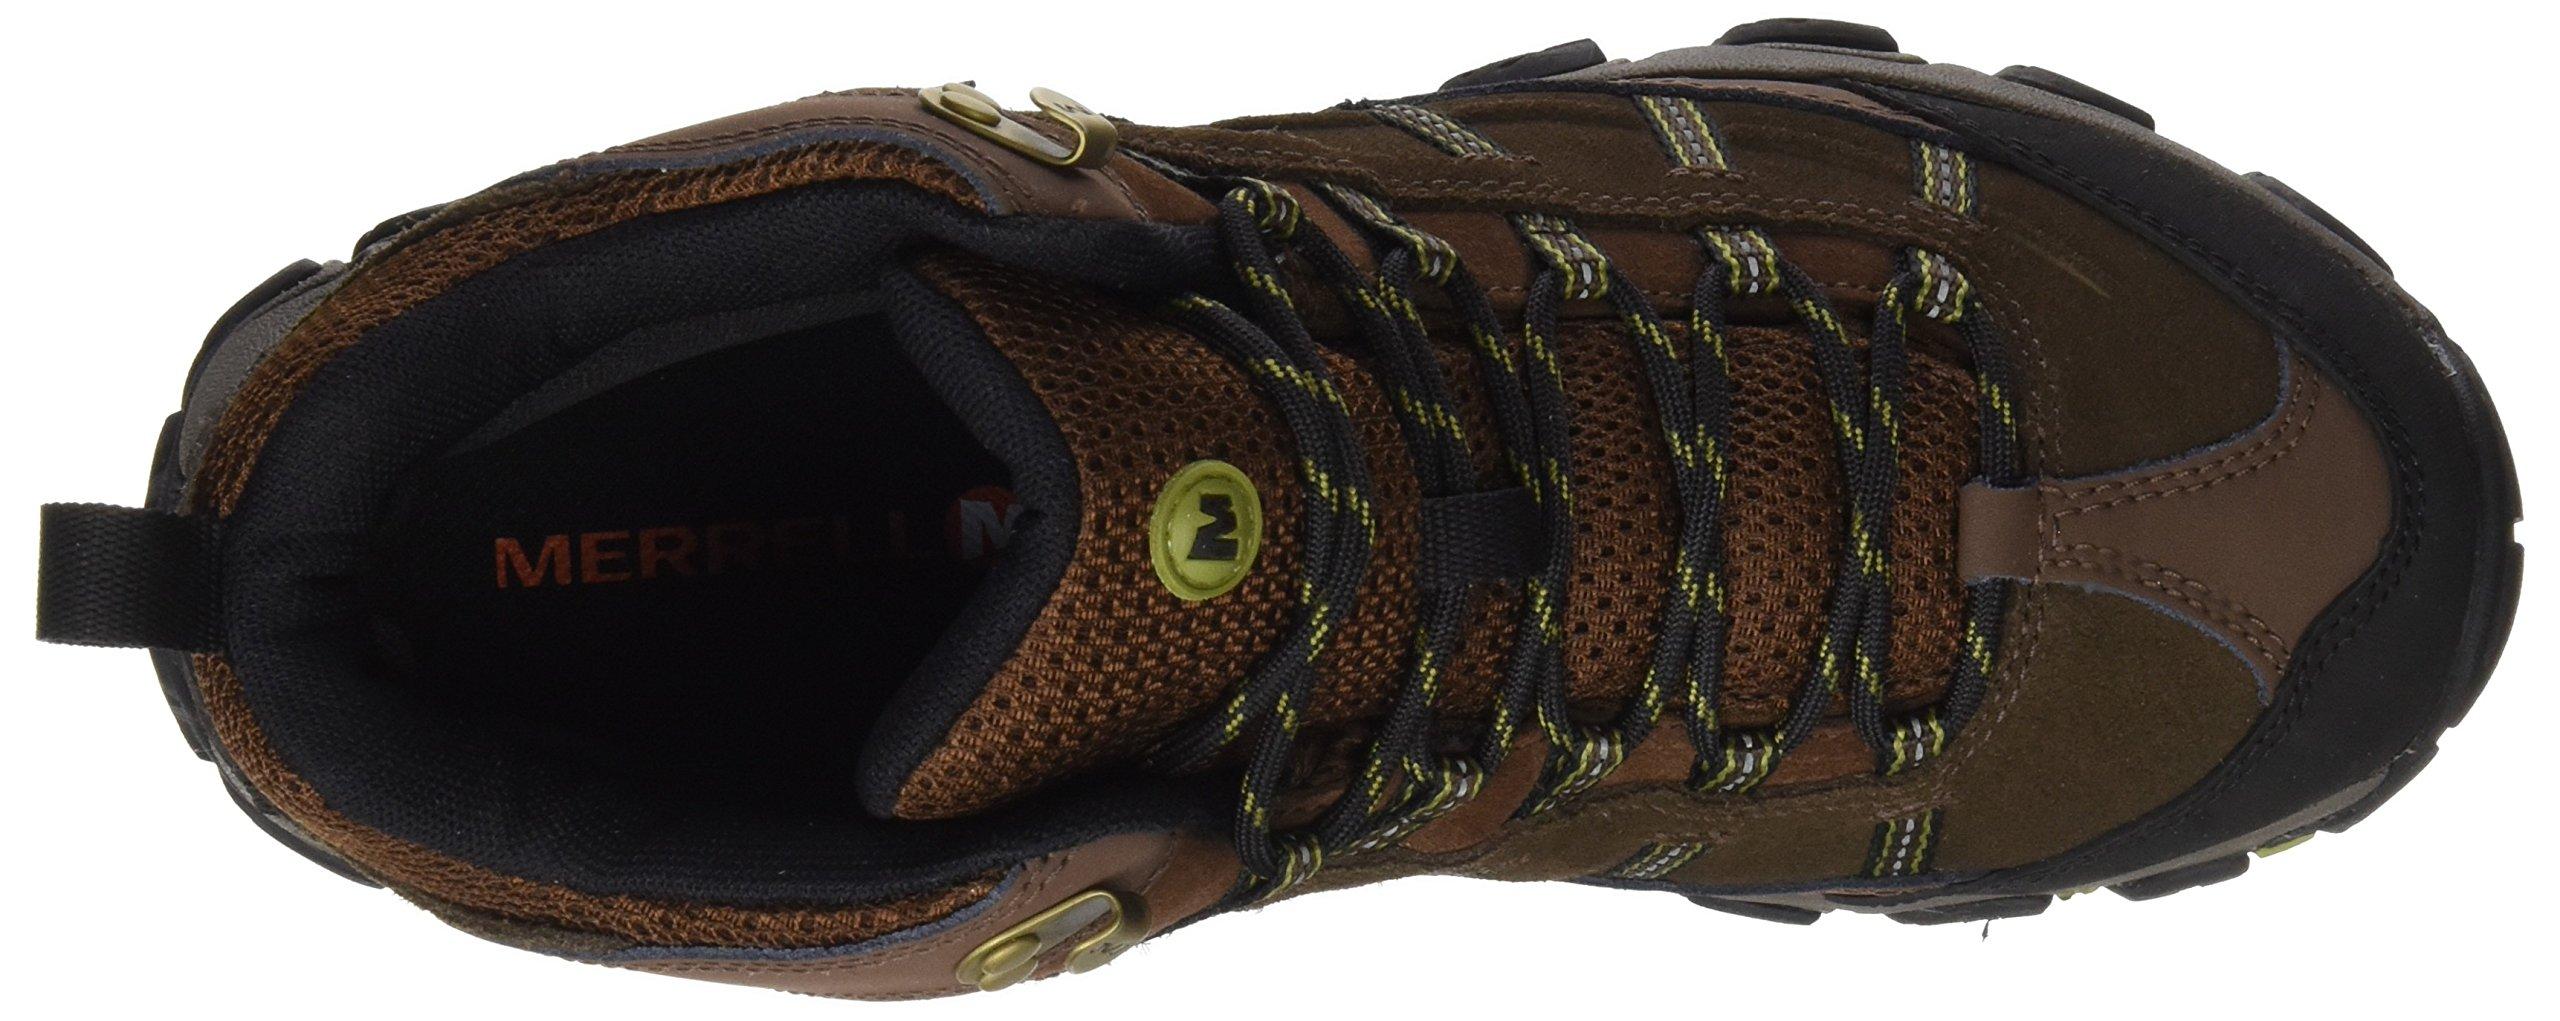 81eX0q1etCL - Merrell Men's Terramorph Mid Waterproof High Rise Hiking Boots